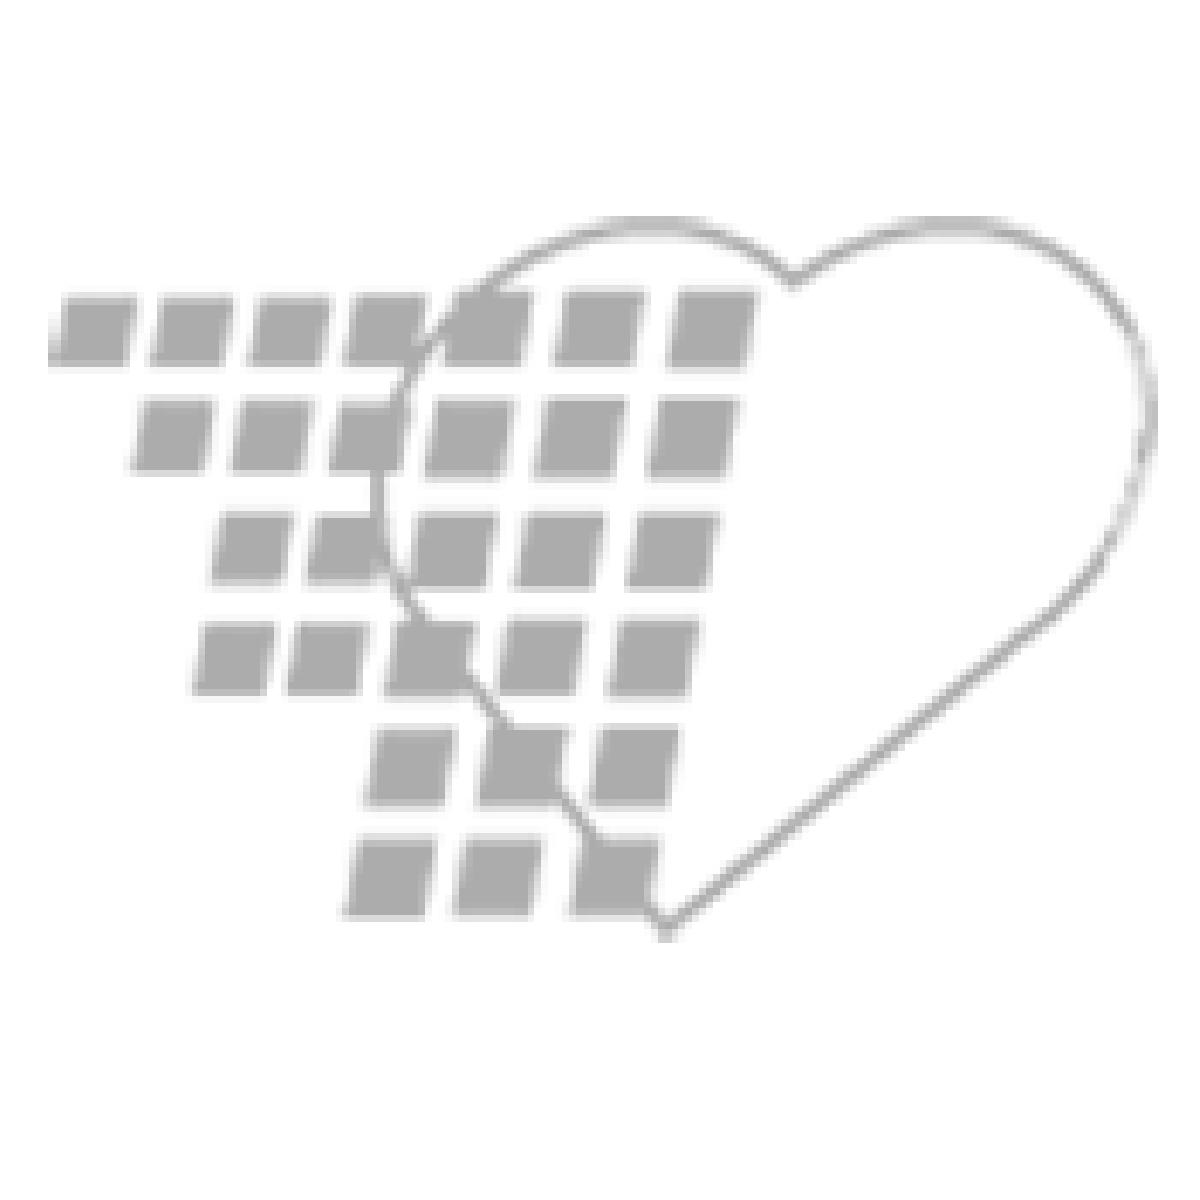 02-70-1257 - Graham Field Ishihara Test Chart - 10 Plates